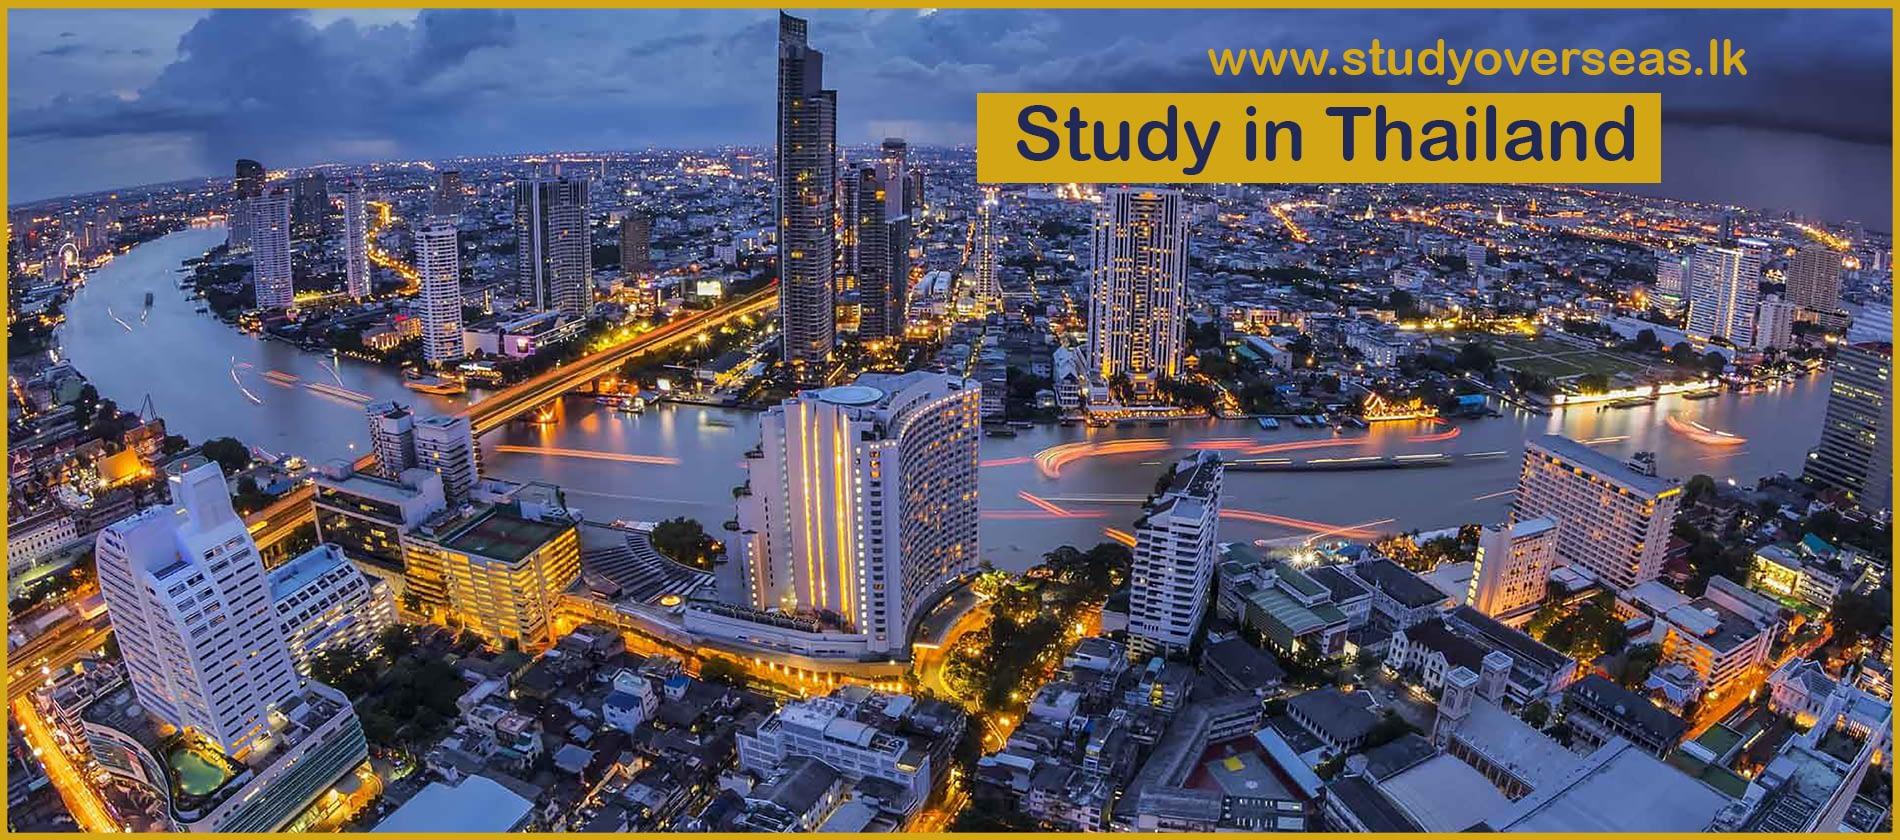 study_in_thailand_www.studyoverseas.lk